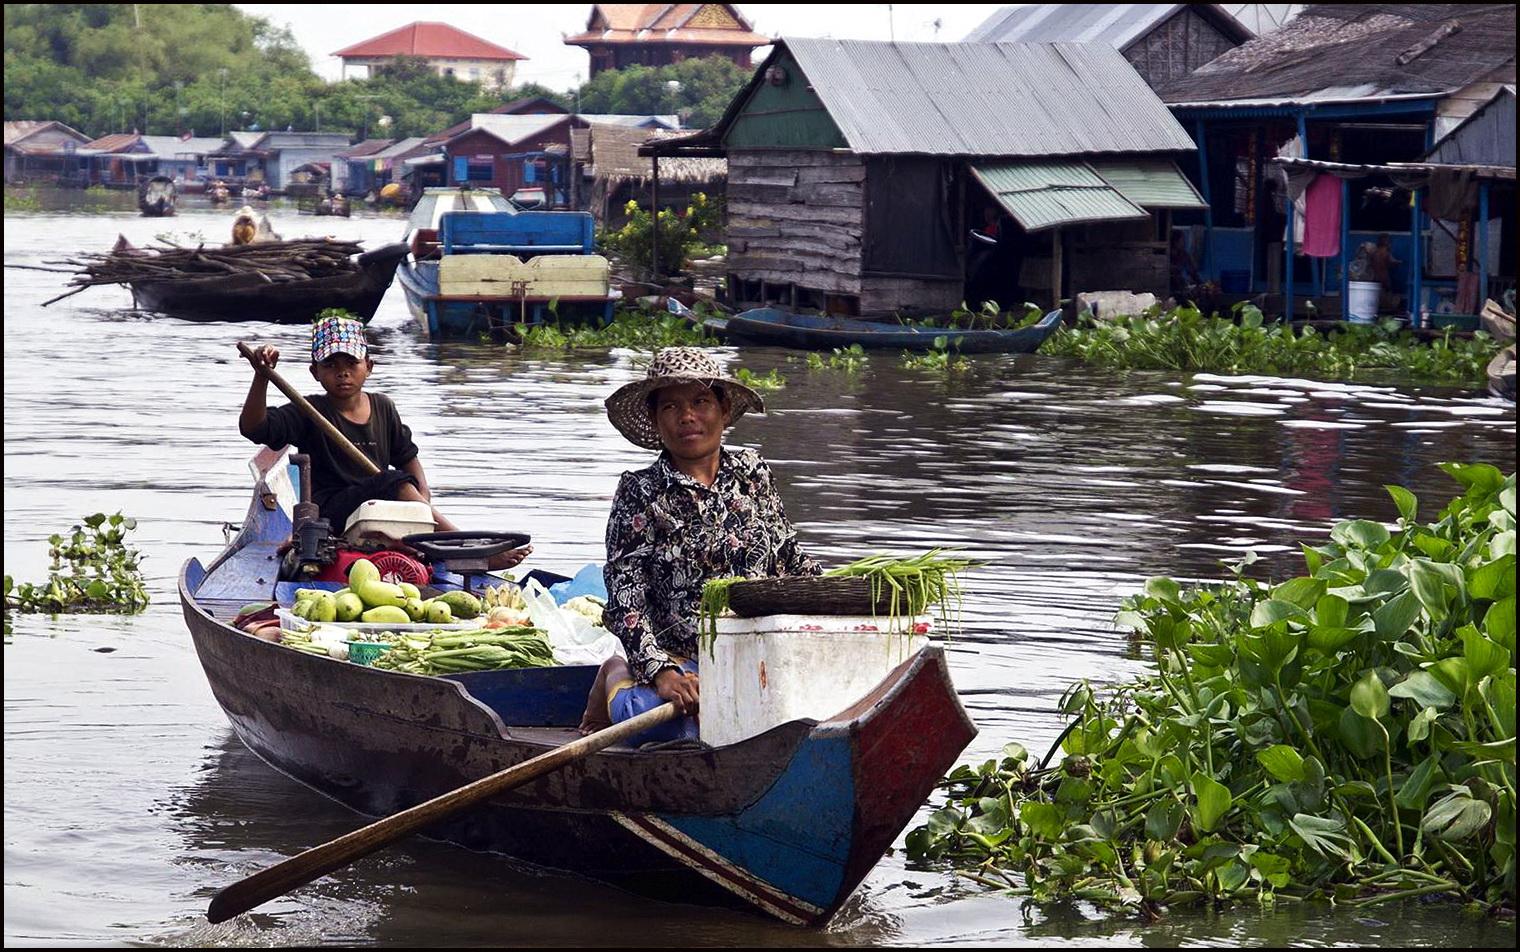 Cambodia Overland tour photos